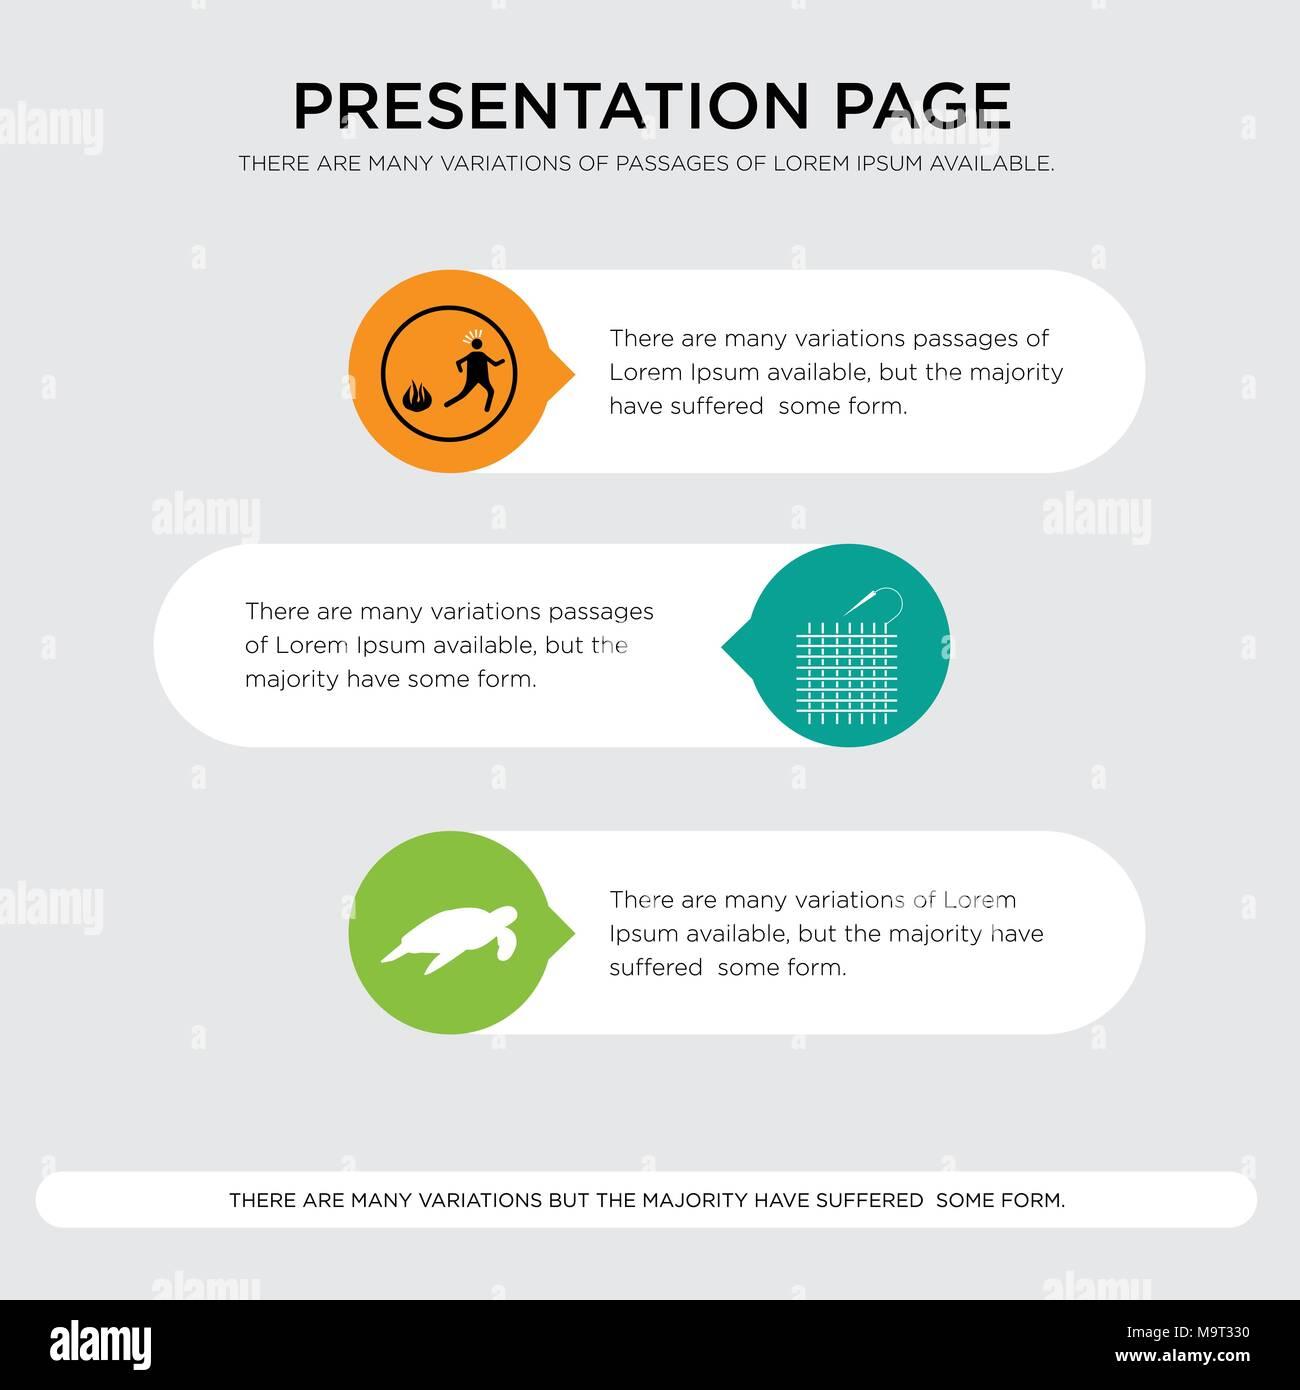 sea turtle weaving panic presentation design template in orange